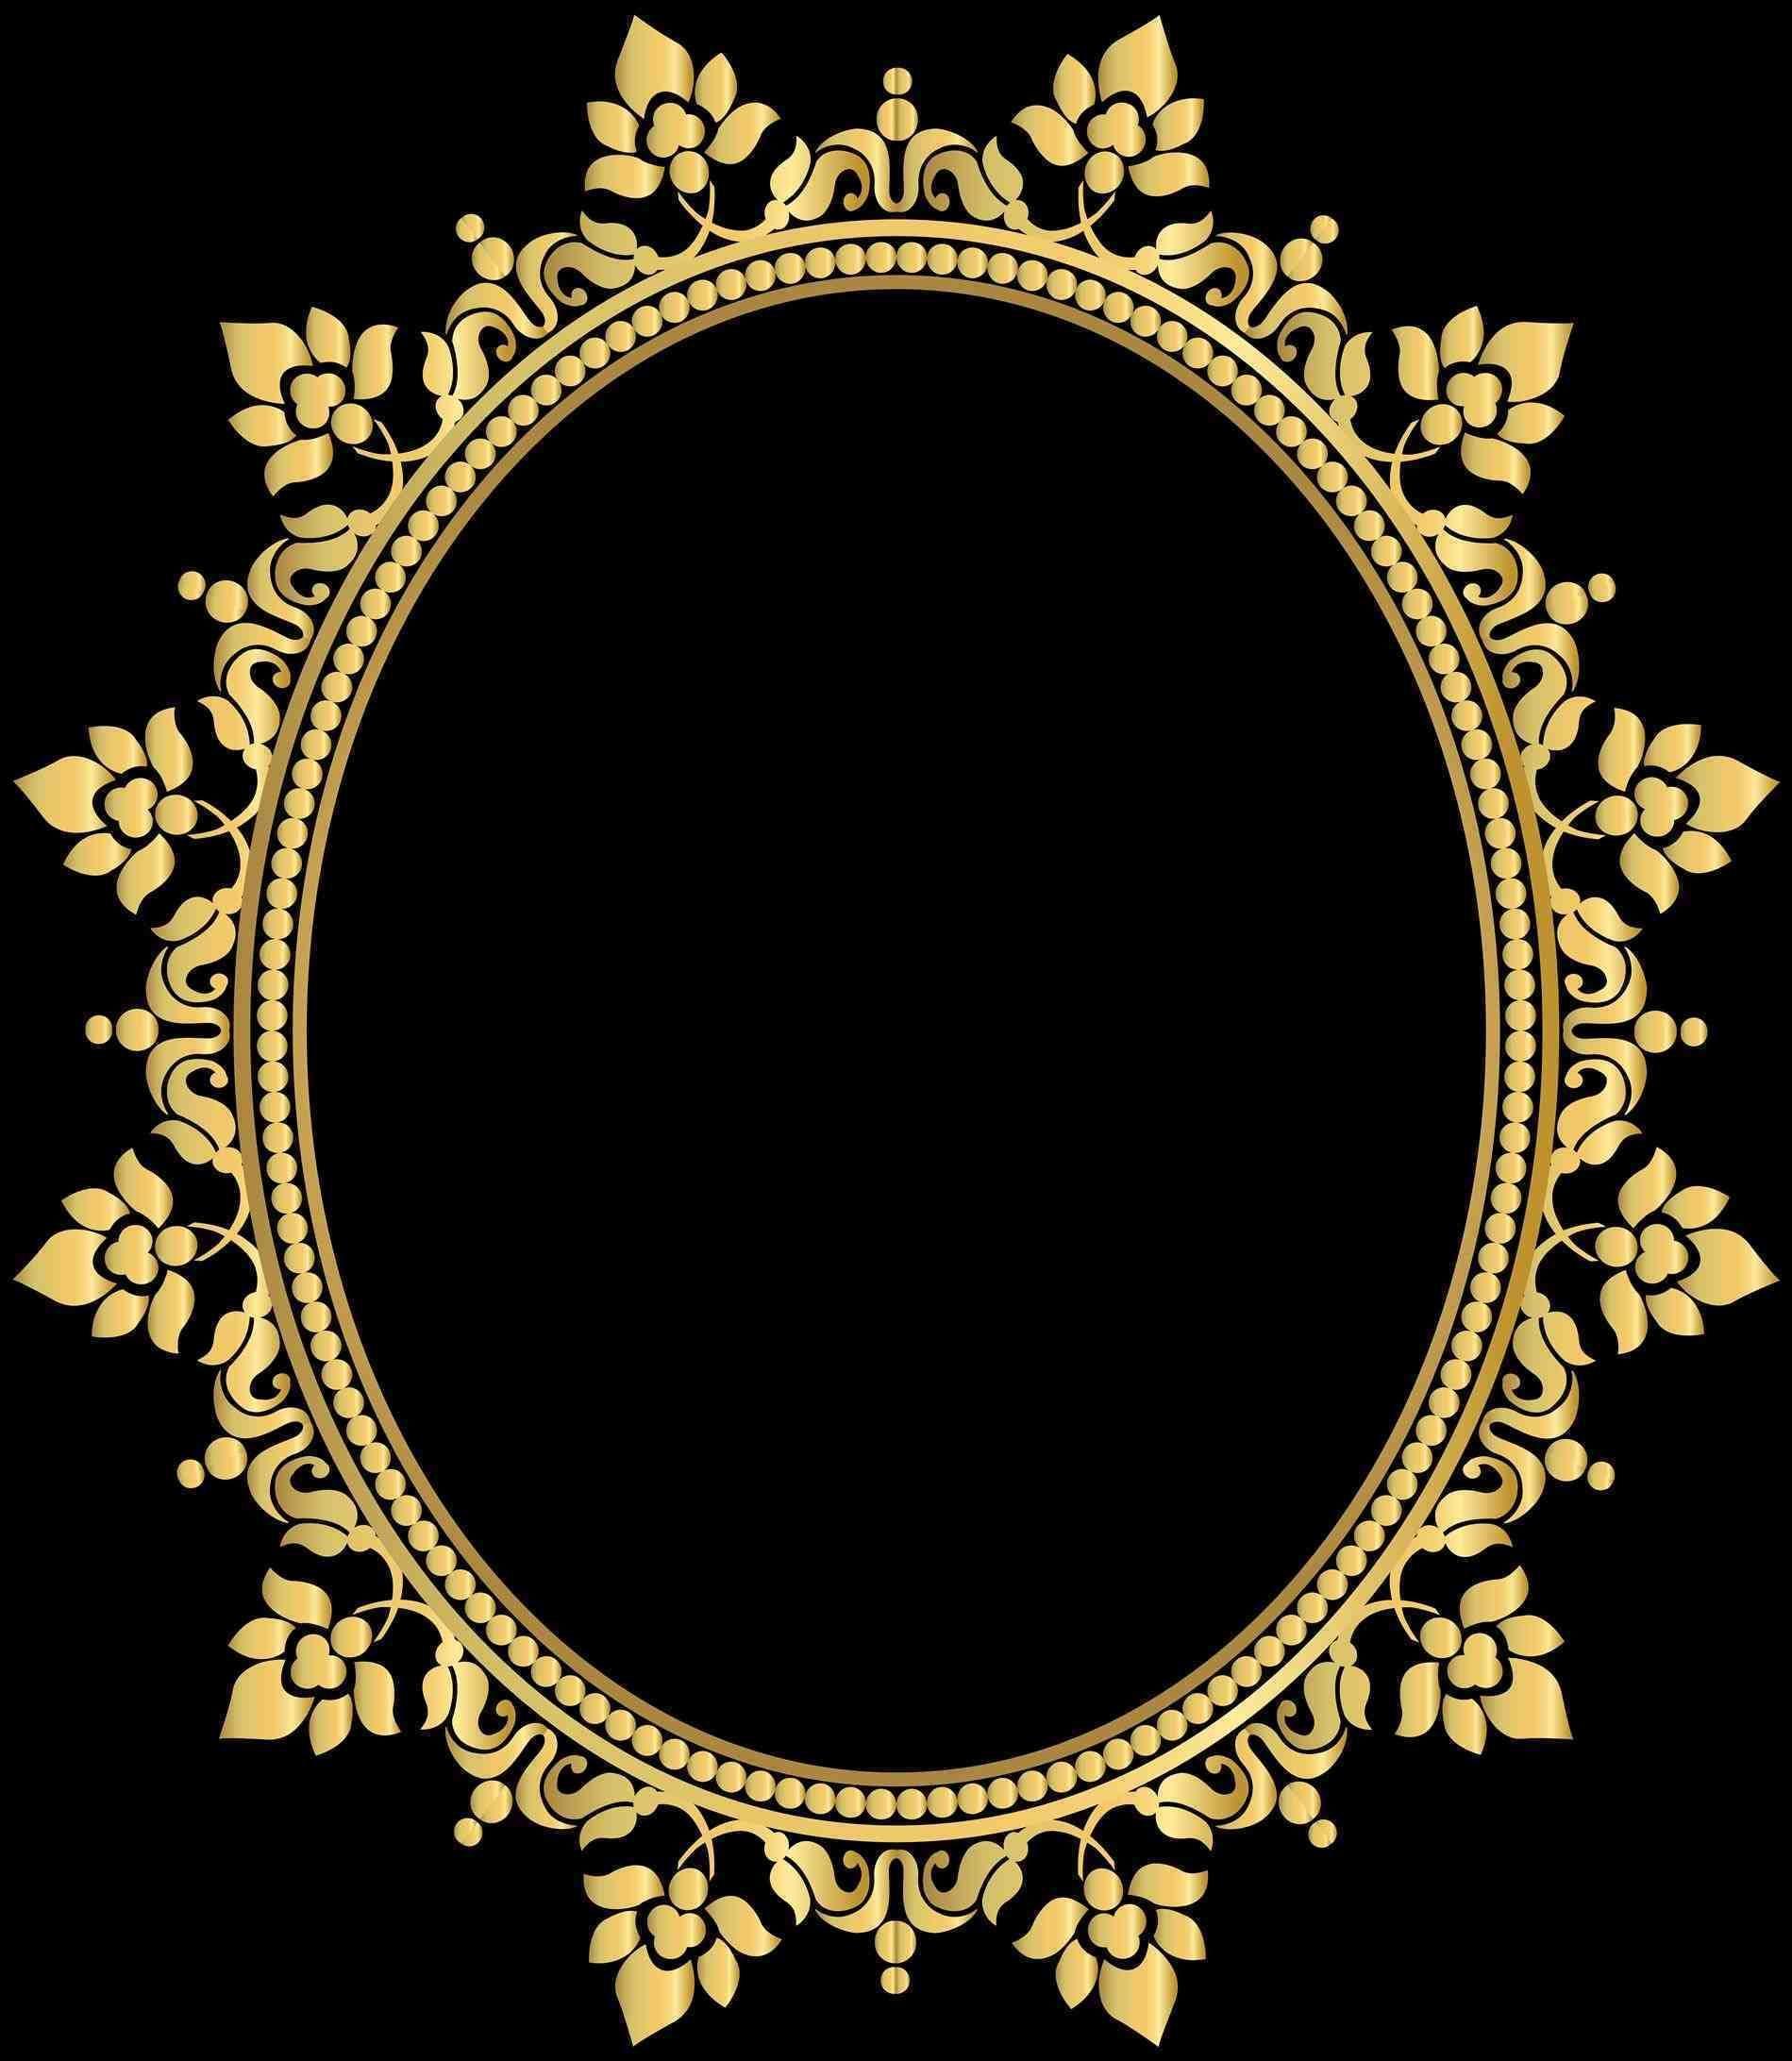 Oval Oval Frame Png Decorative Border Frame Transparent Clip Art Png Image Rhgalleryyopricevillecom Picture Deco Tanjore Painting Decorative Borders Oval Frame